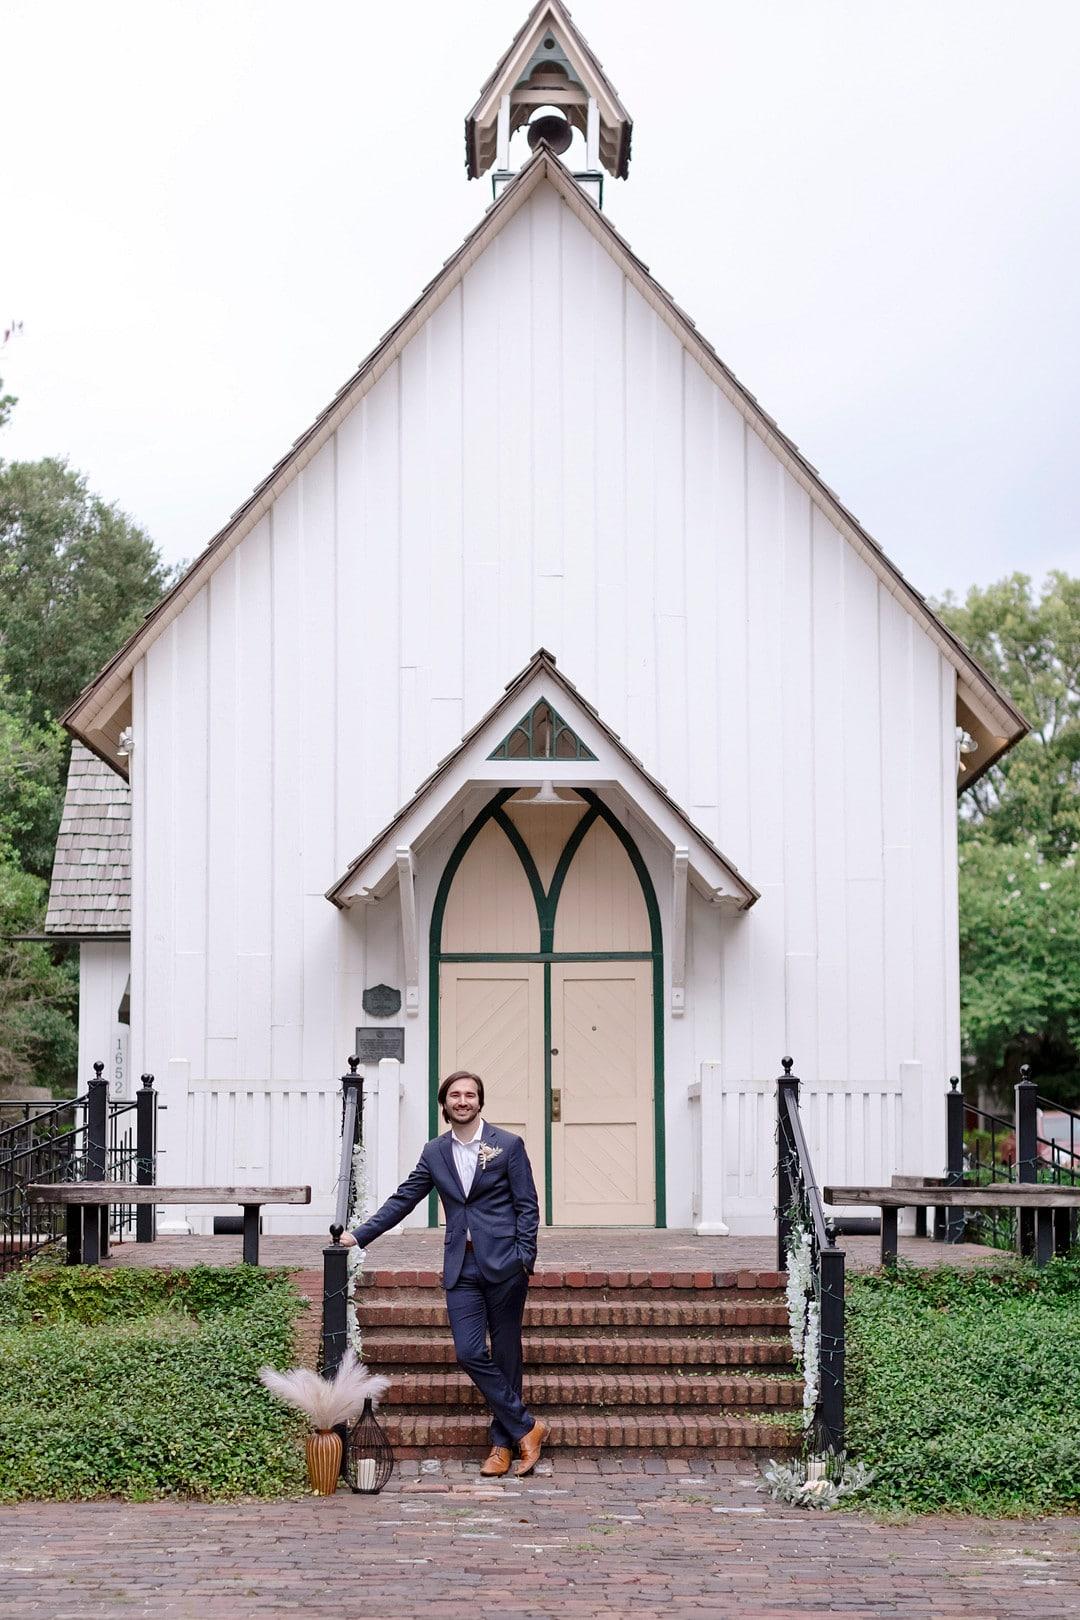 Elegant Boho Wedding Picnic_Susan Dixon Photography, LLC_susan-dixon-047_low